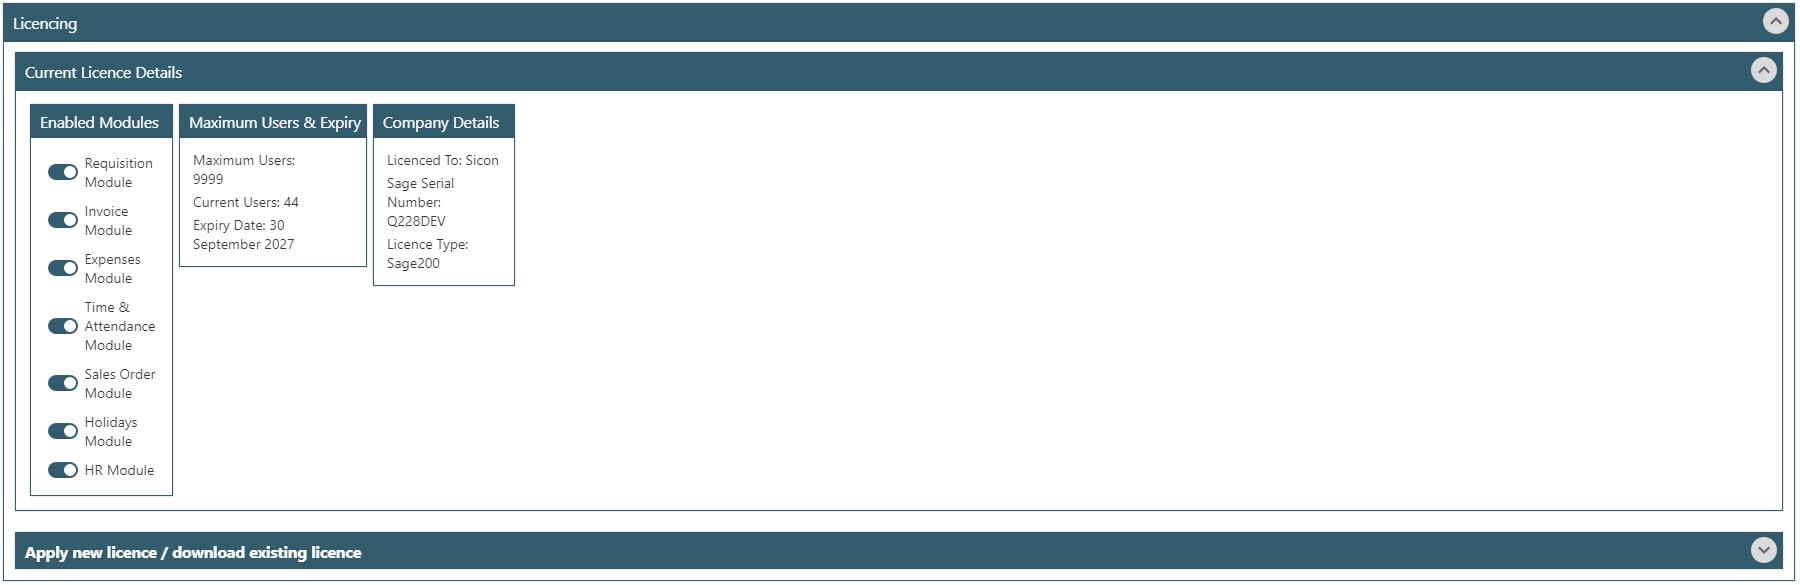 Sicon WAP Holidays Help and User Guide - WAP Holidays HUG Section 2 - Image 1